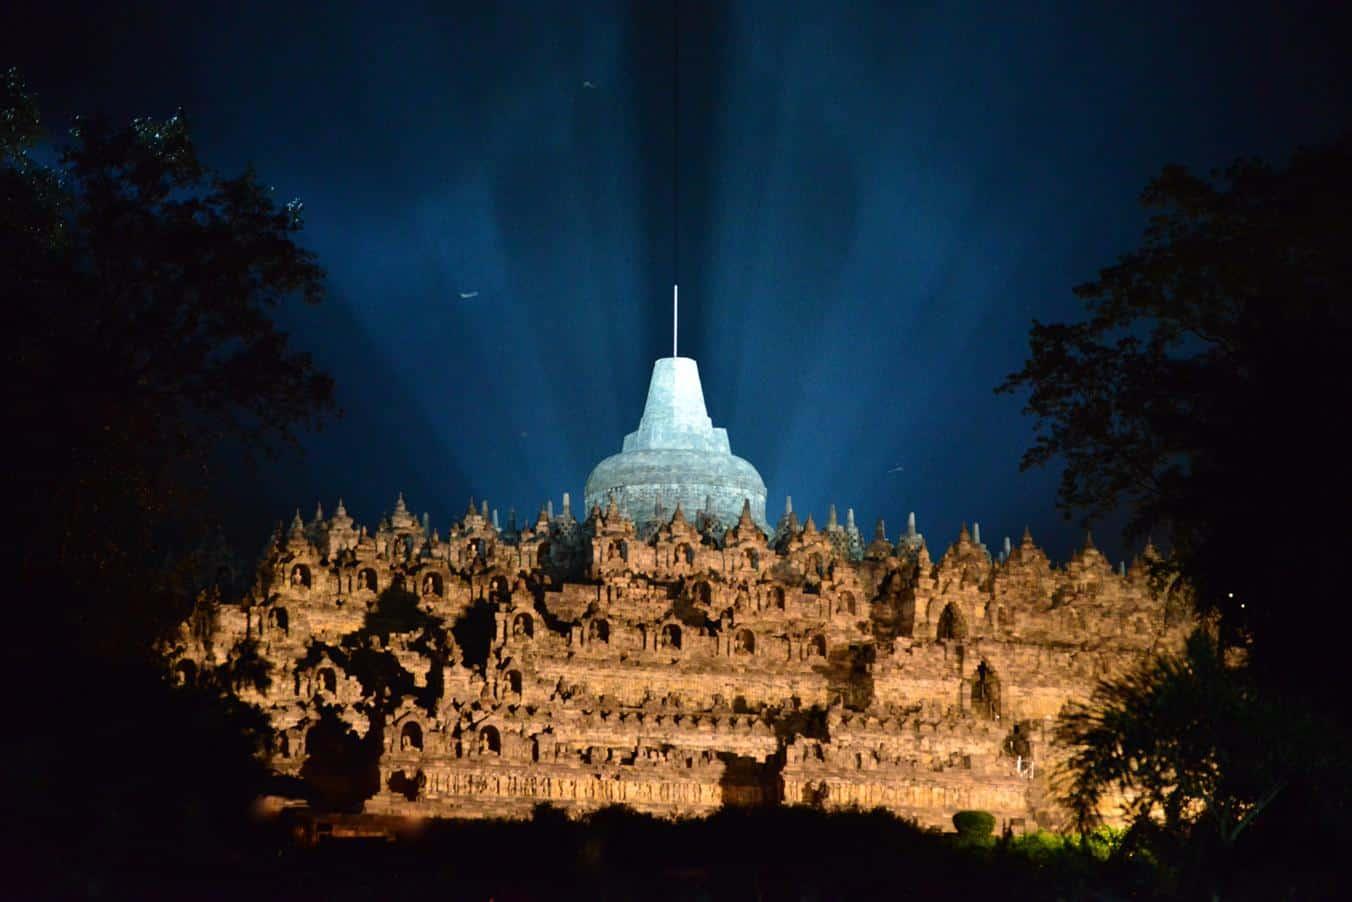 borobodur indonesia big stupa light